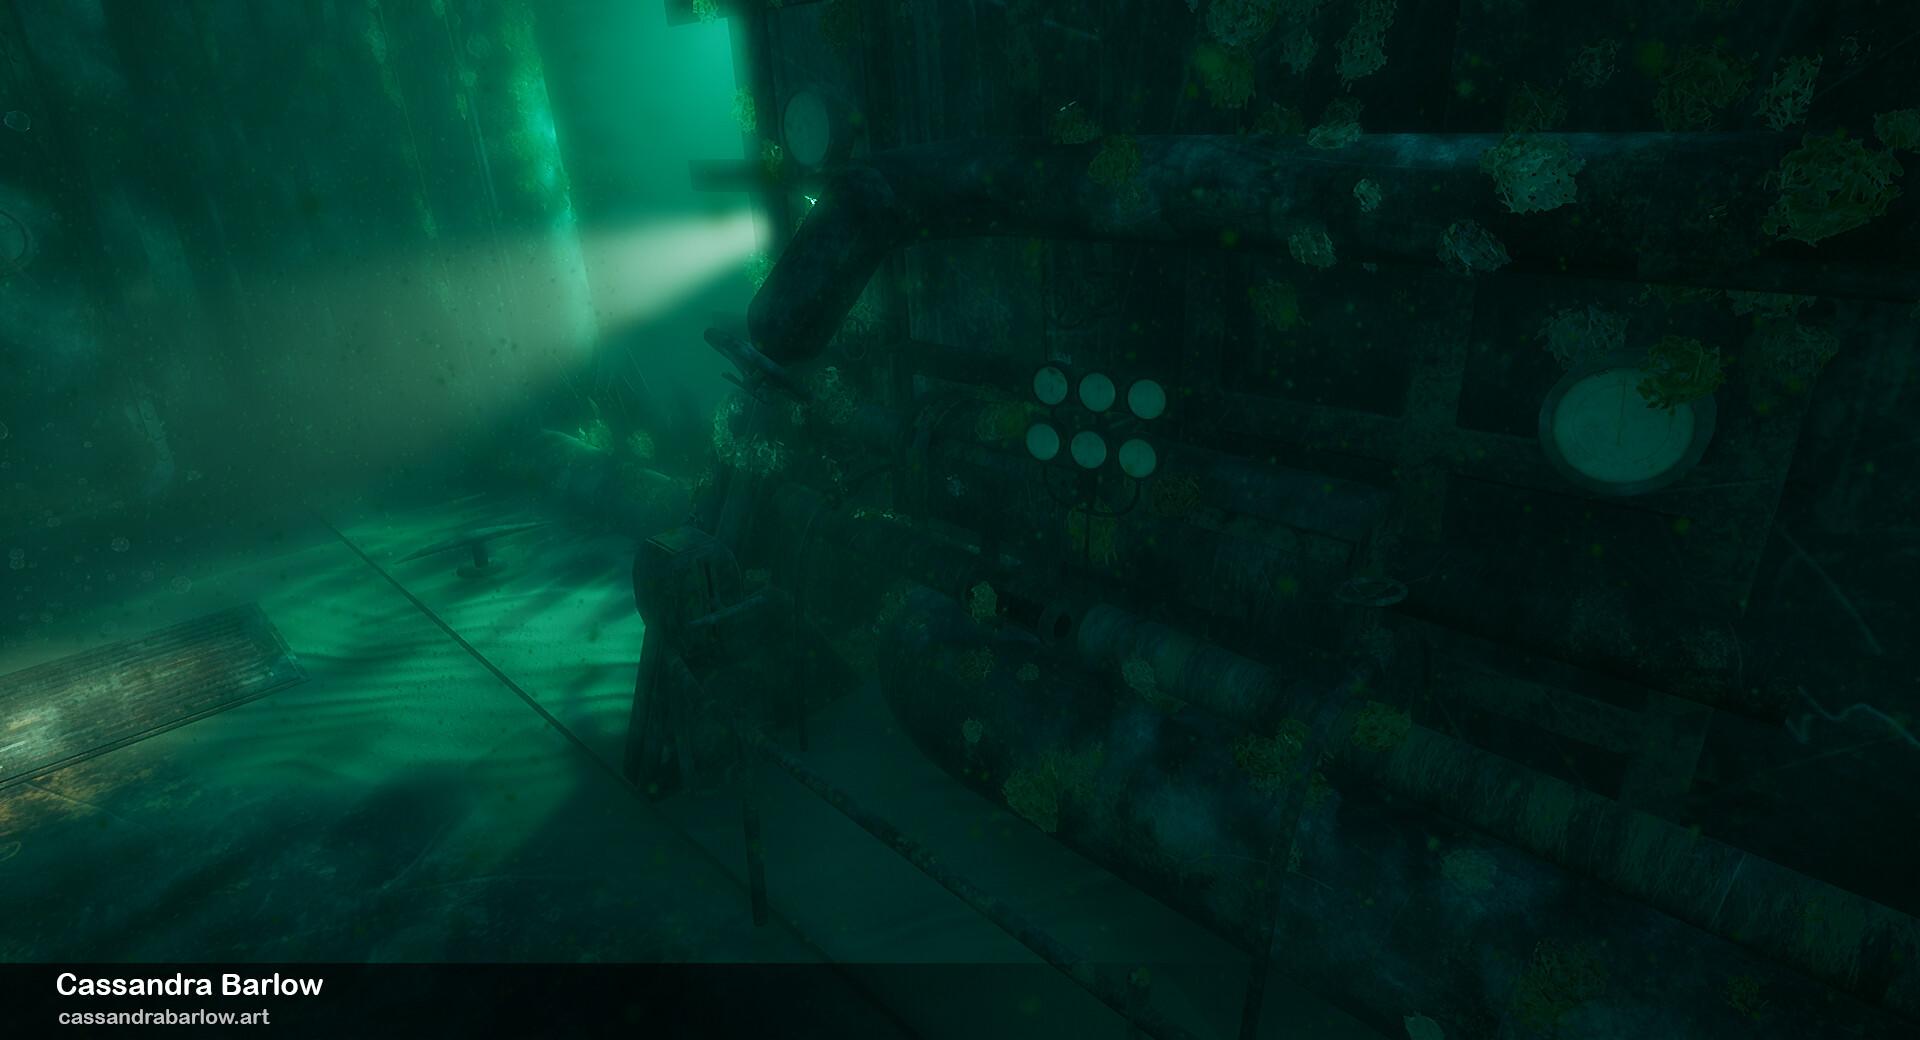 Cassandra barlow cassandrabarlow submarinewreck 3